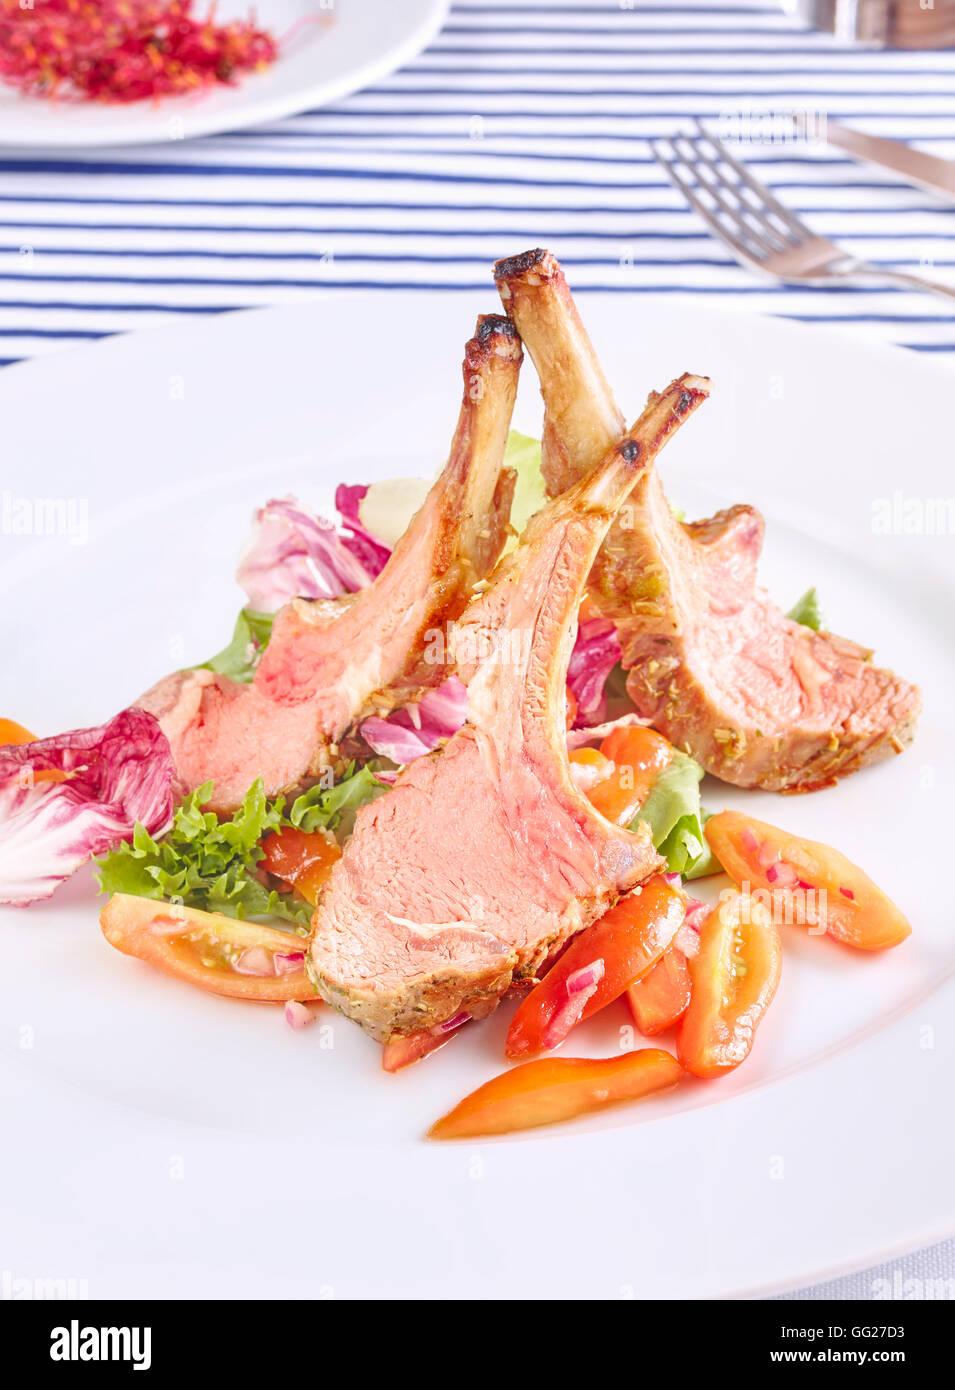 Roasted lamb rib chops with salad and tomatoes. - Stock Image